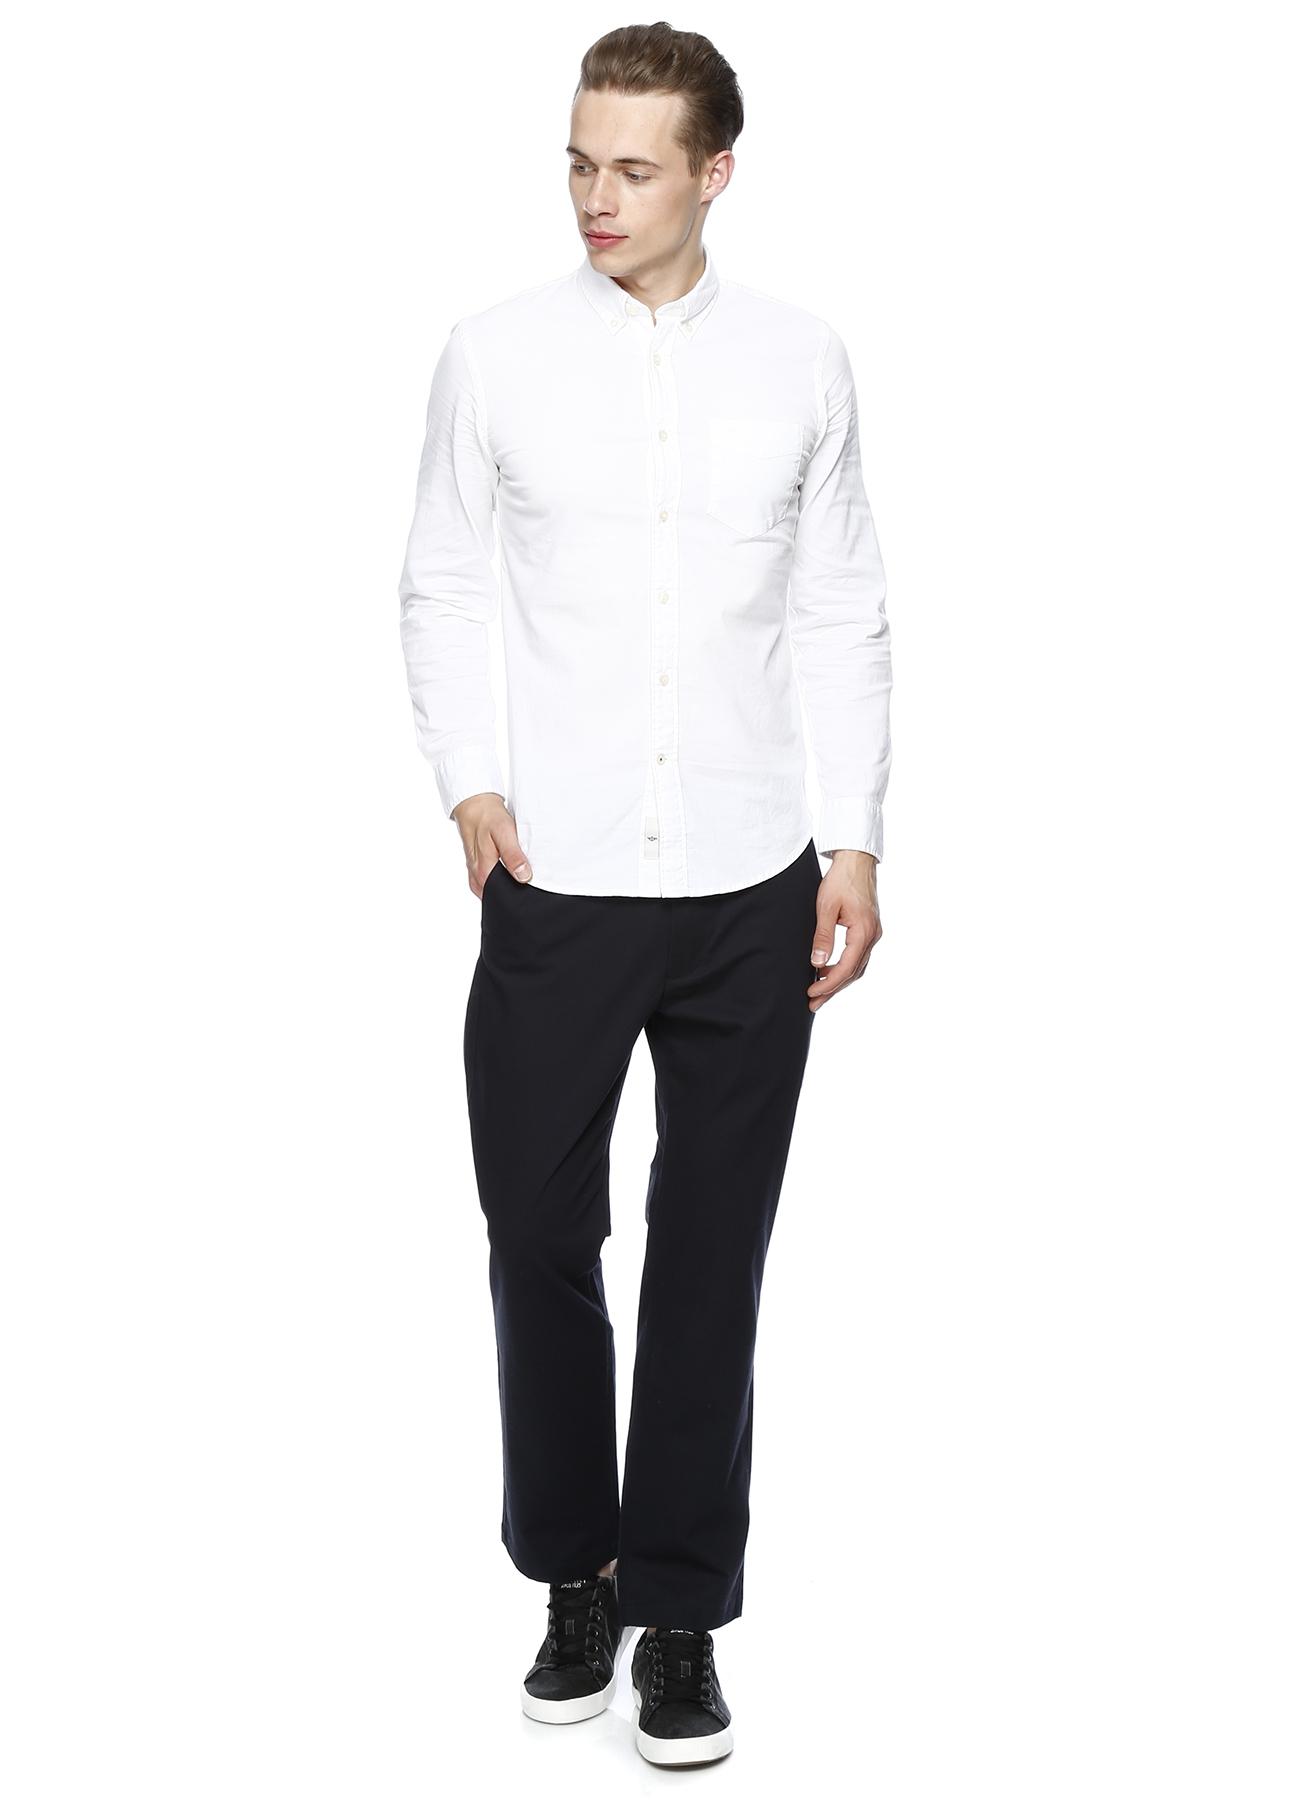 Dockers Standard Clean Khaki Slim - Stretch Twill Klasik Pantolon 34-30 5000131918007 Ürün Resmi